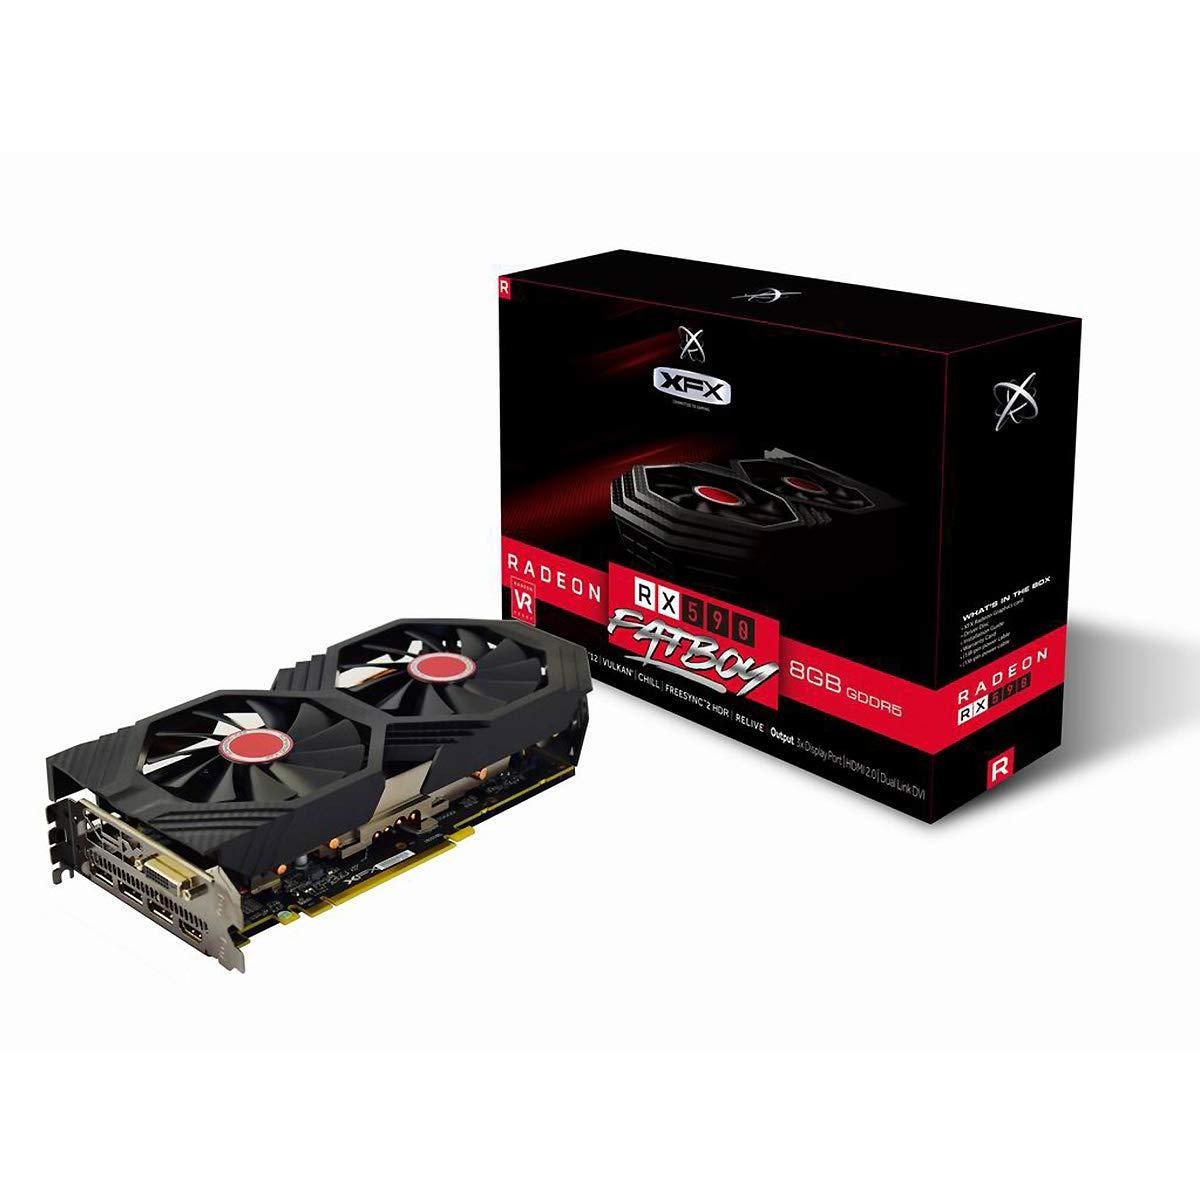 XFX RX-590P8DFD6 Radeon Rx 590 Fatboy 8GB OC+ 1580MHz DDR5 3xDP HDMI DVI Graphic Cards by XFX (Image #1)